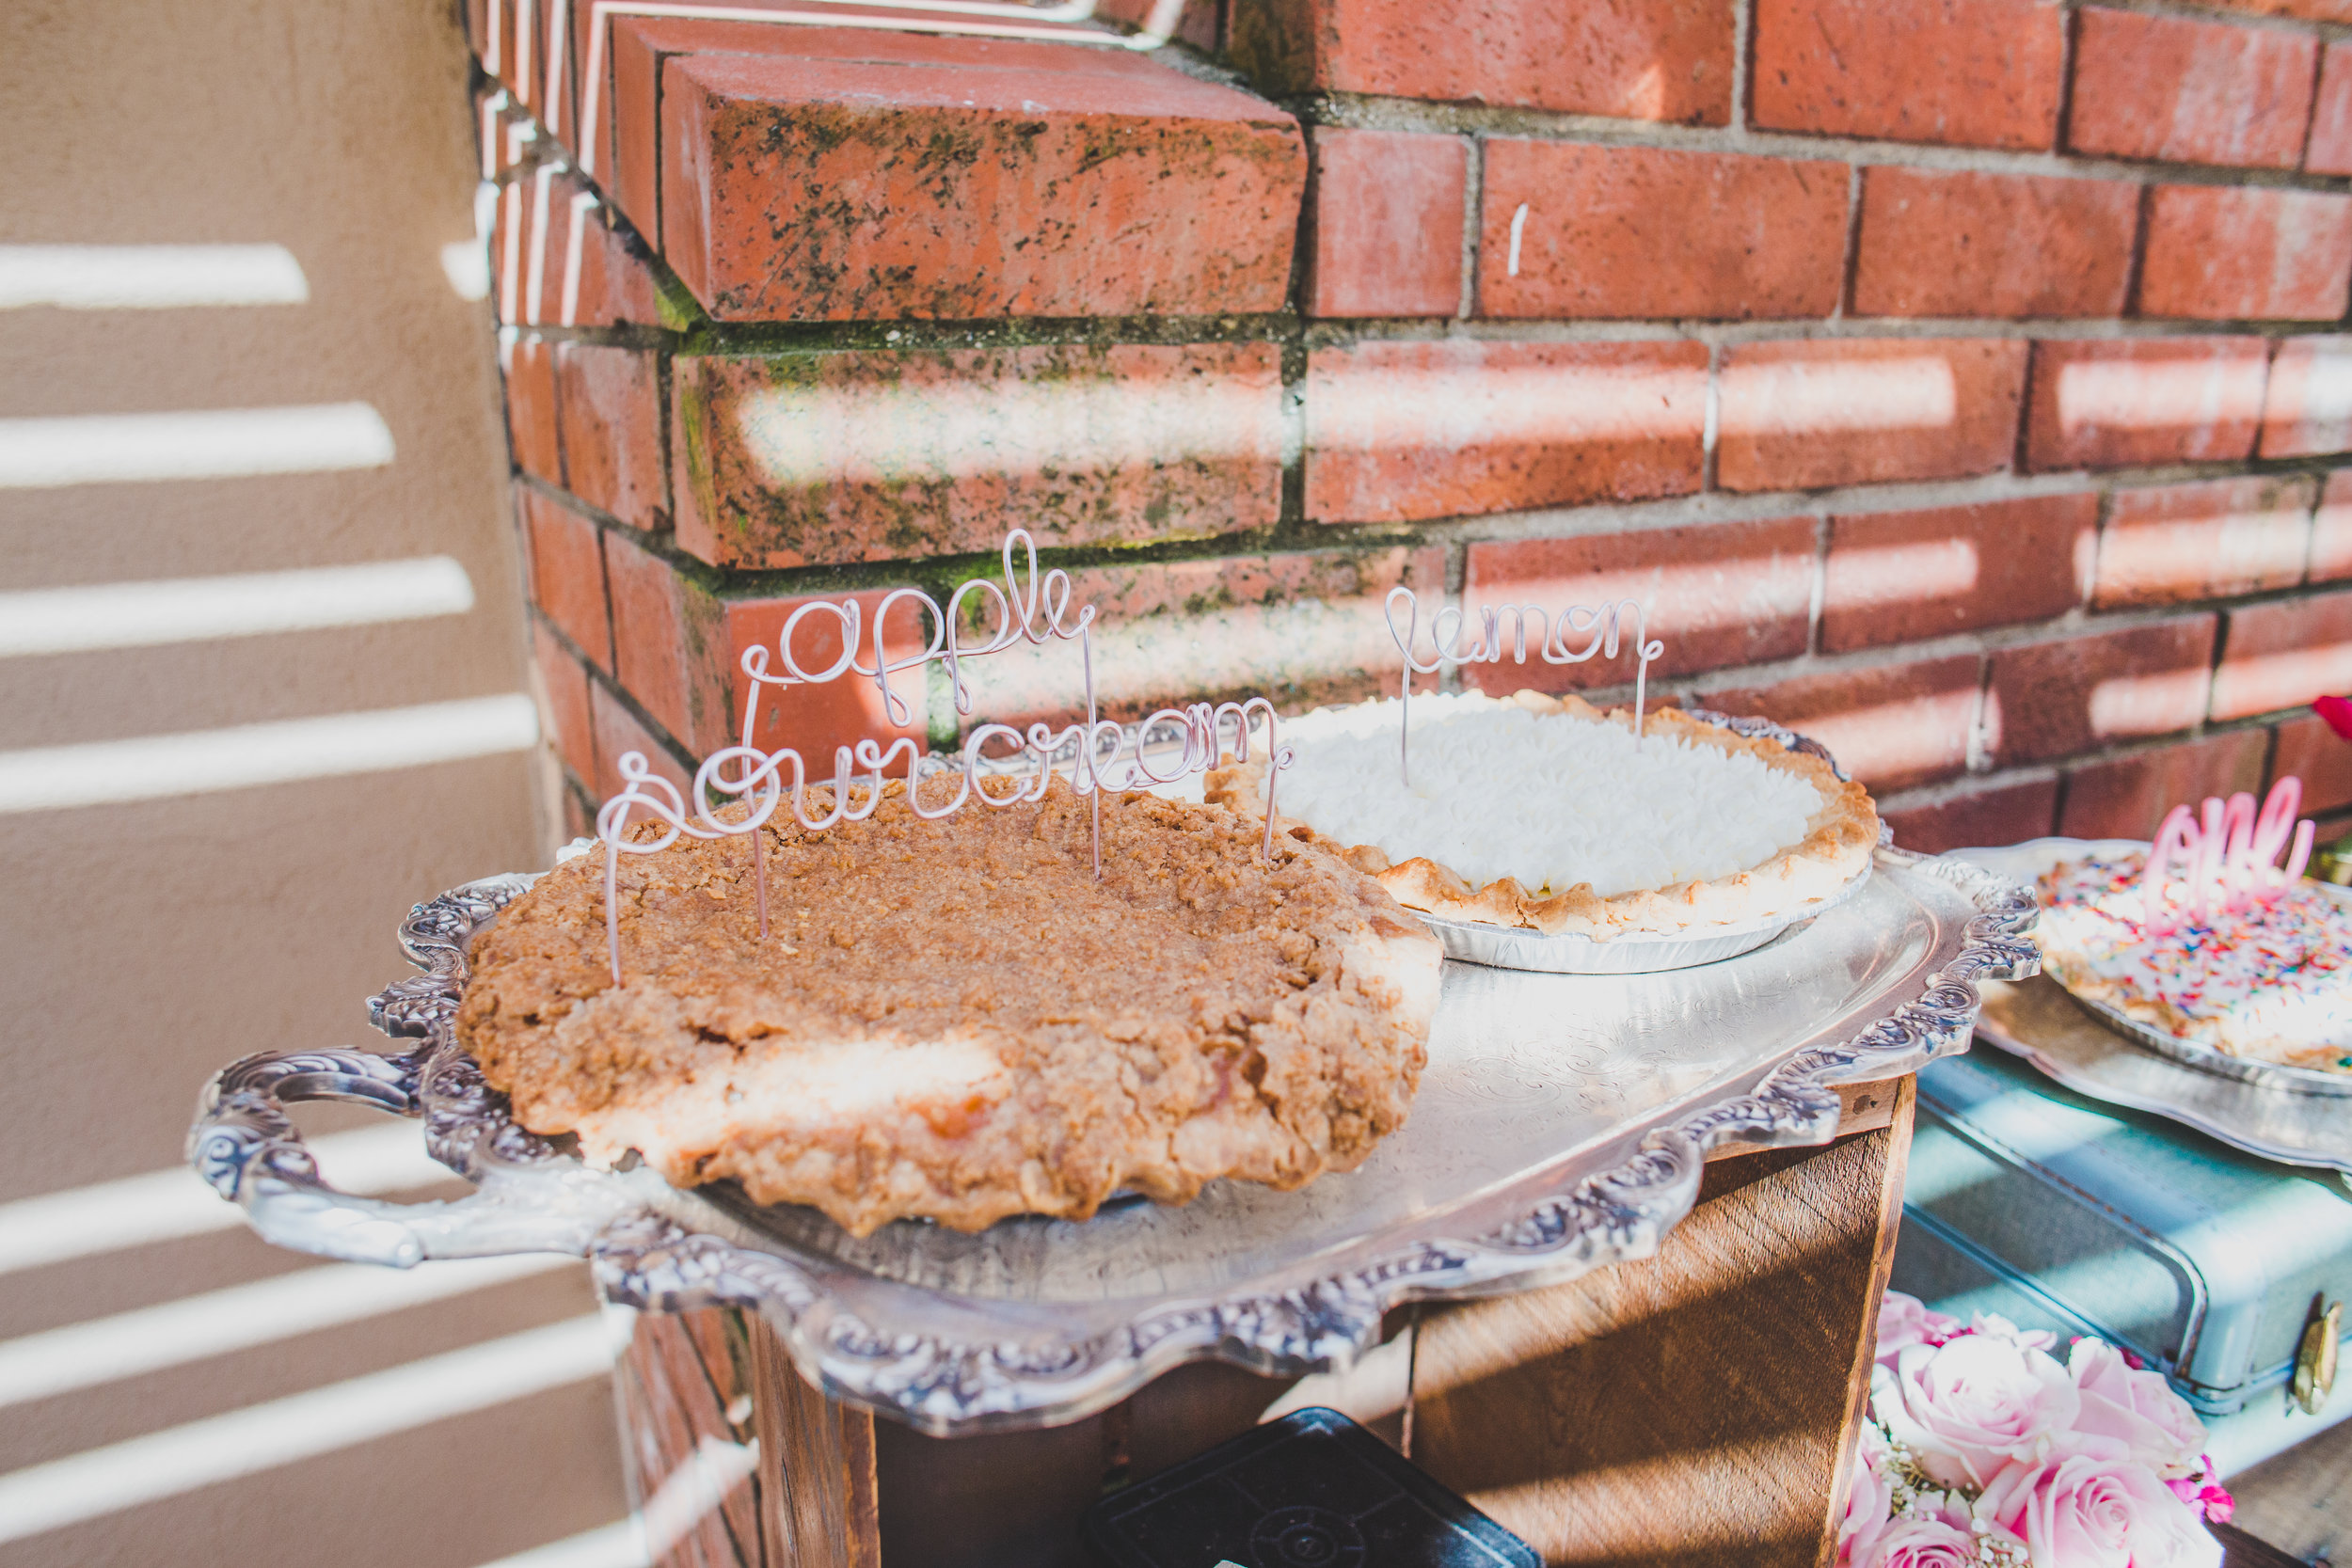 Vintage Pie Bar - First Birthday Party Ideas - A Vintage Chic Pi Day Themed 1st Birthday Party   Ava's First Birthday